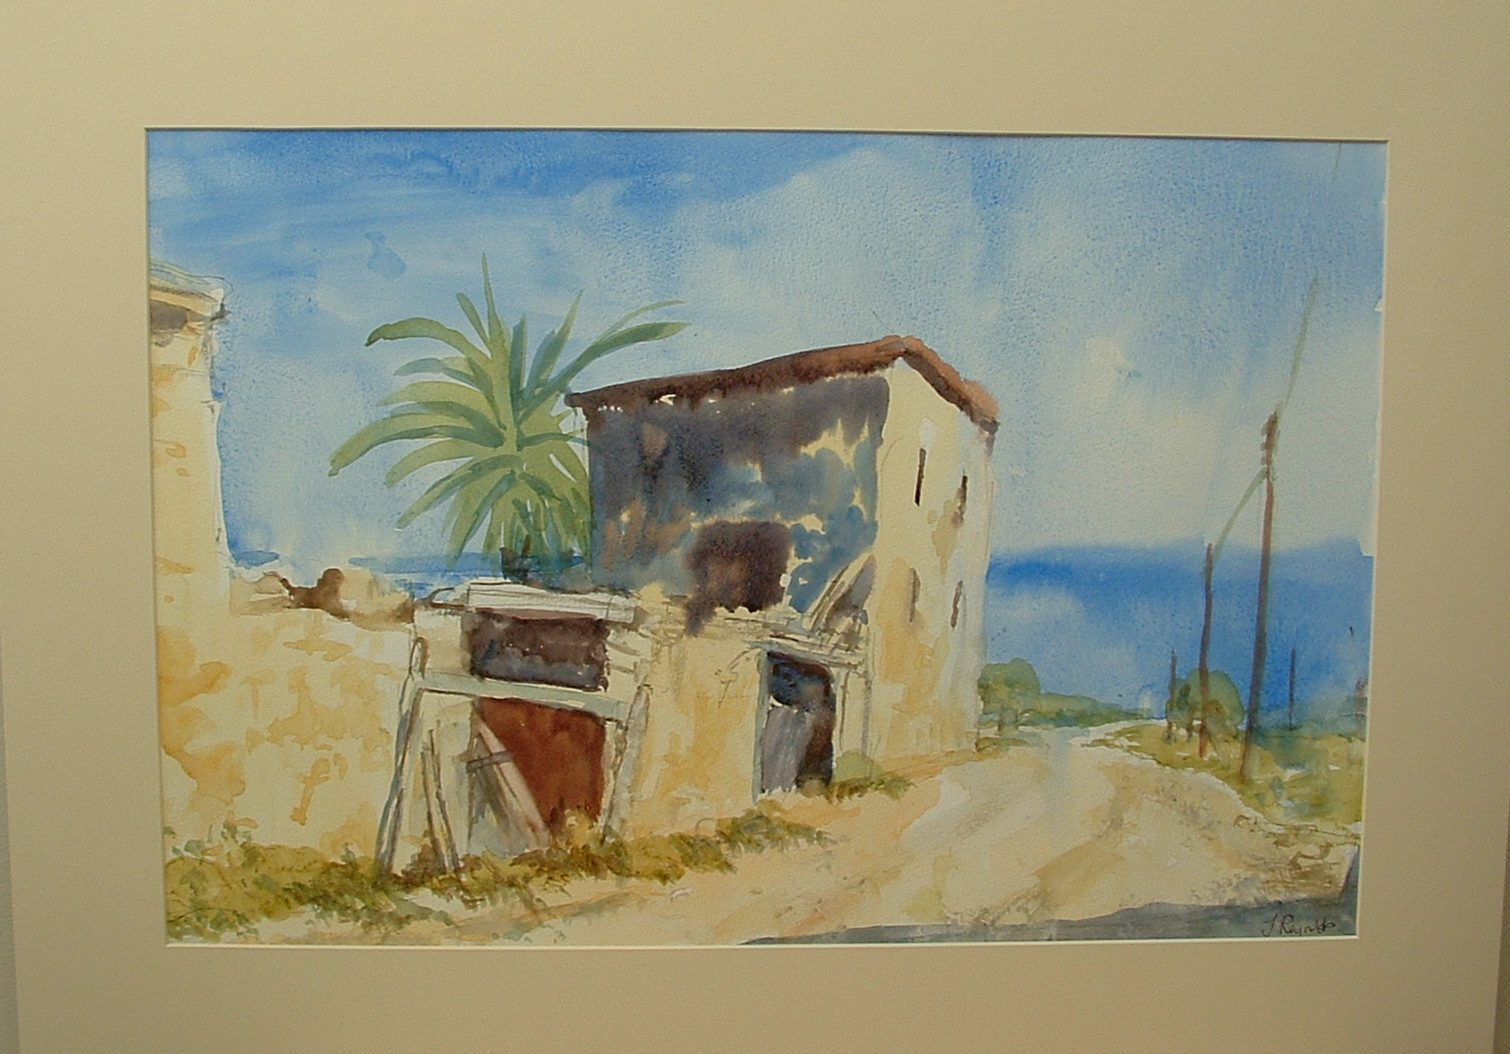 Mediterranean buildings by the sea painting by Ian Reynolds